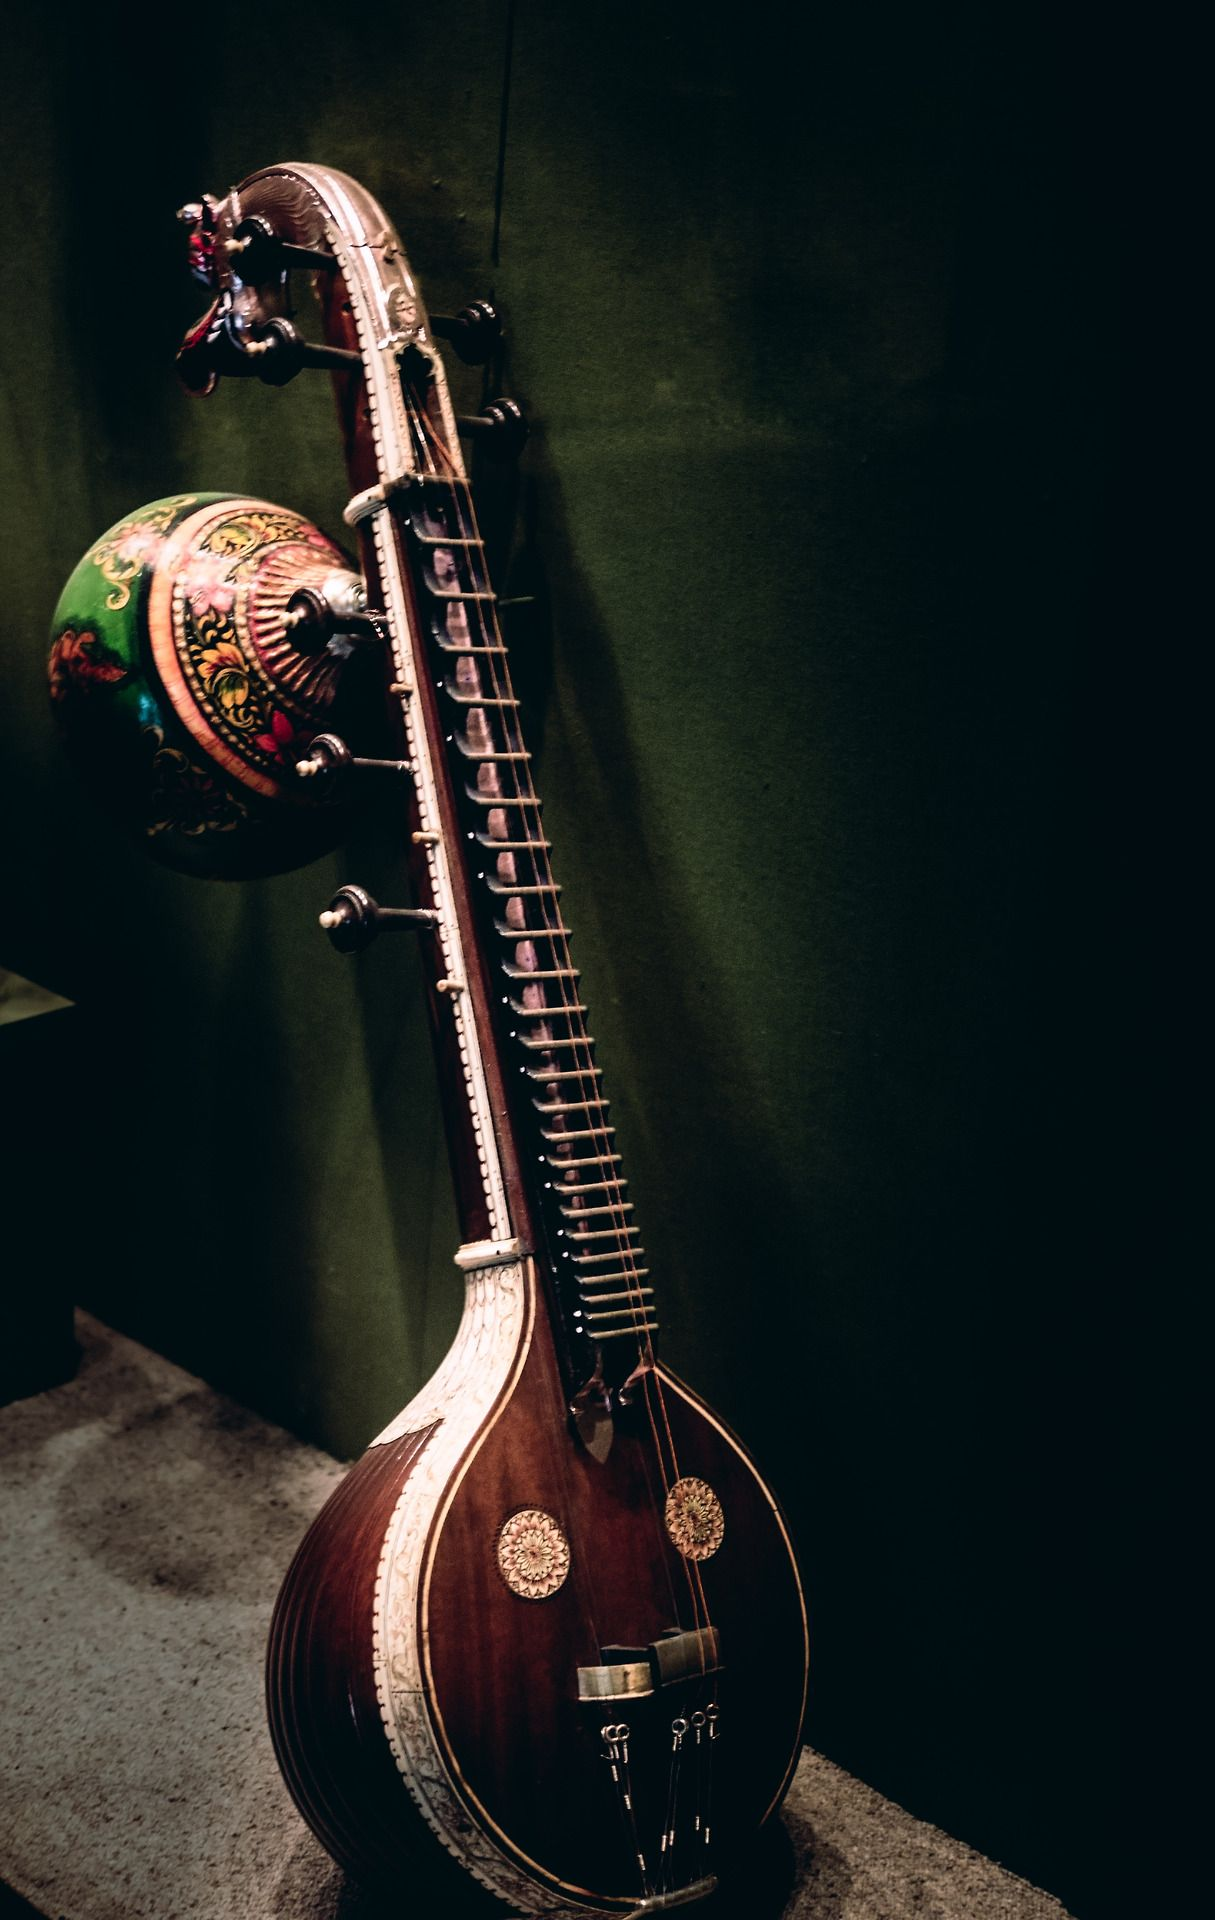 Saraswati Veena - a stringed instrument used in carnatic classical